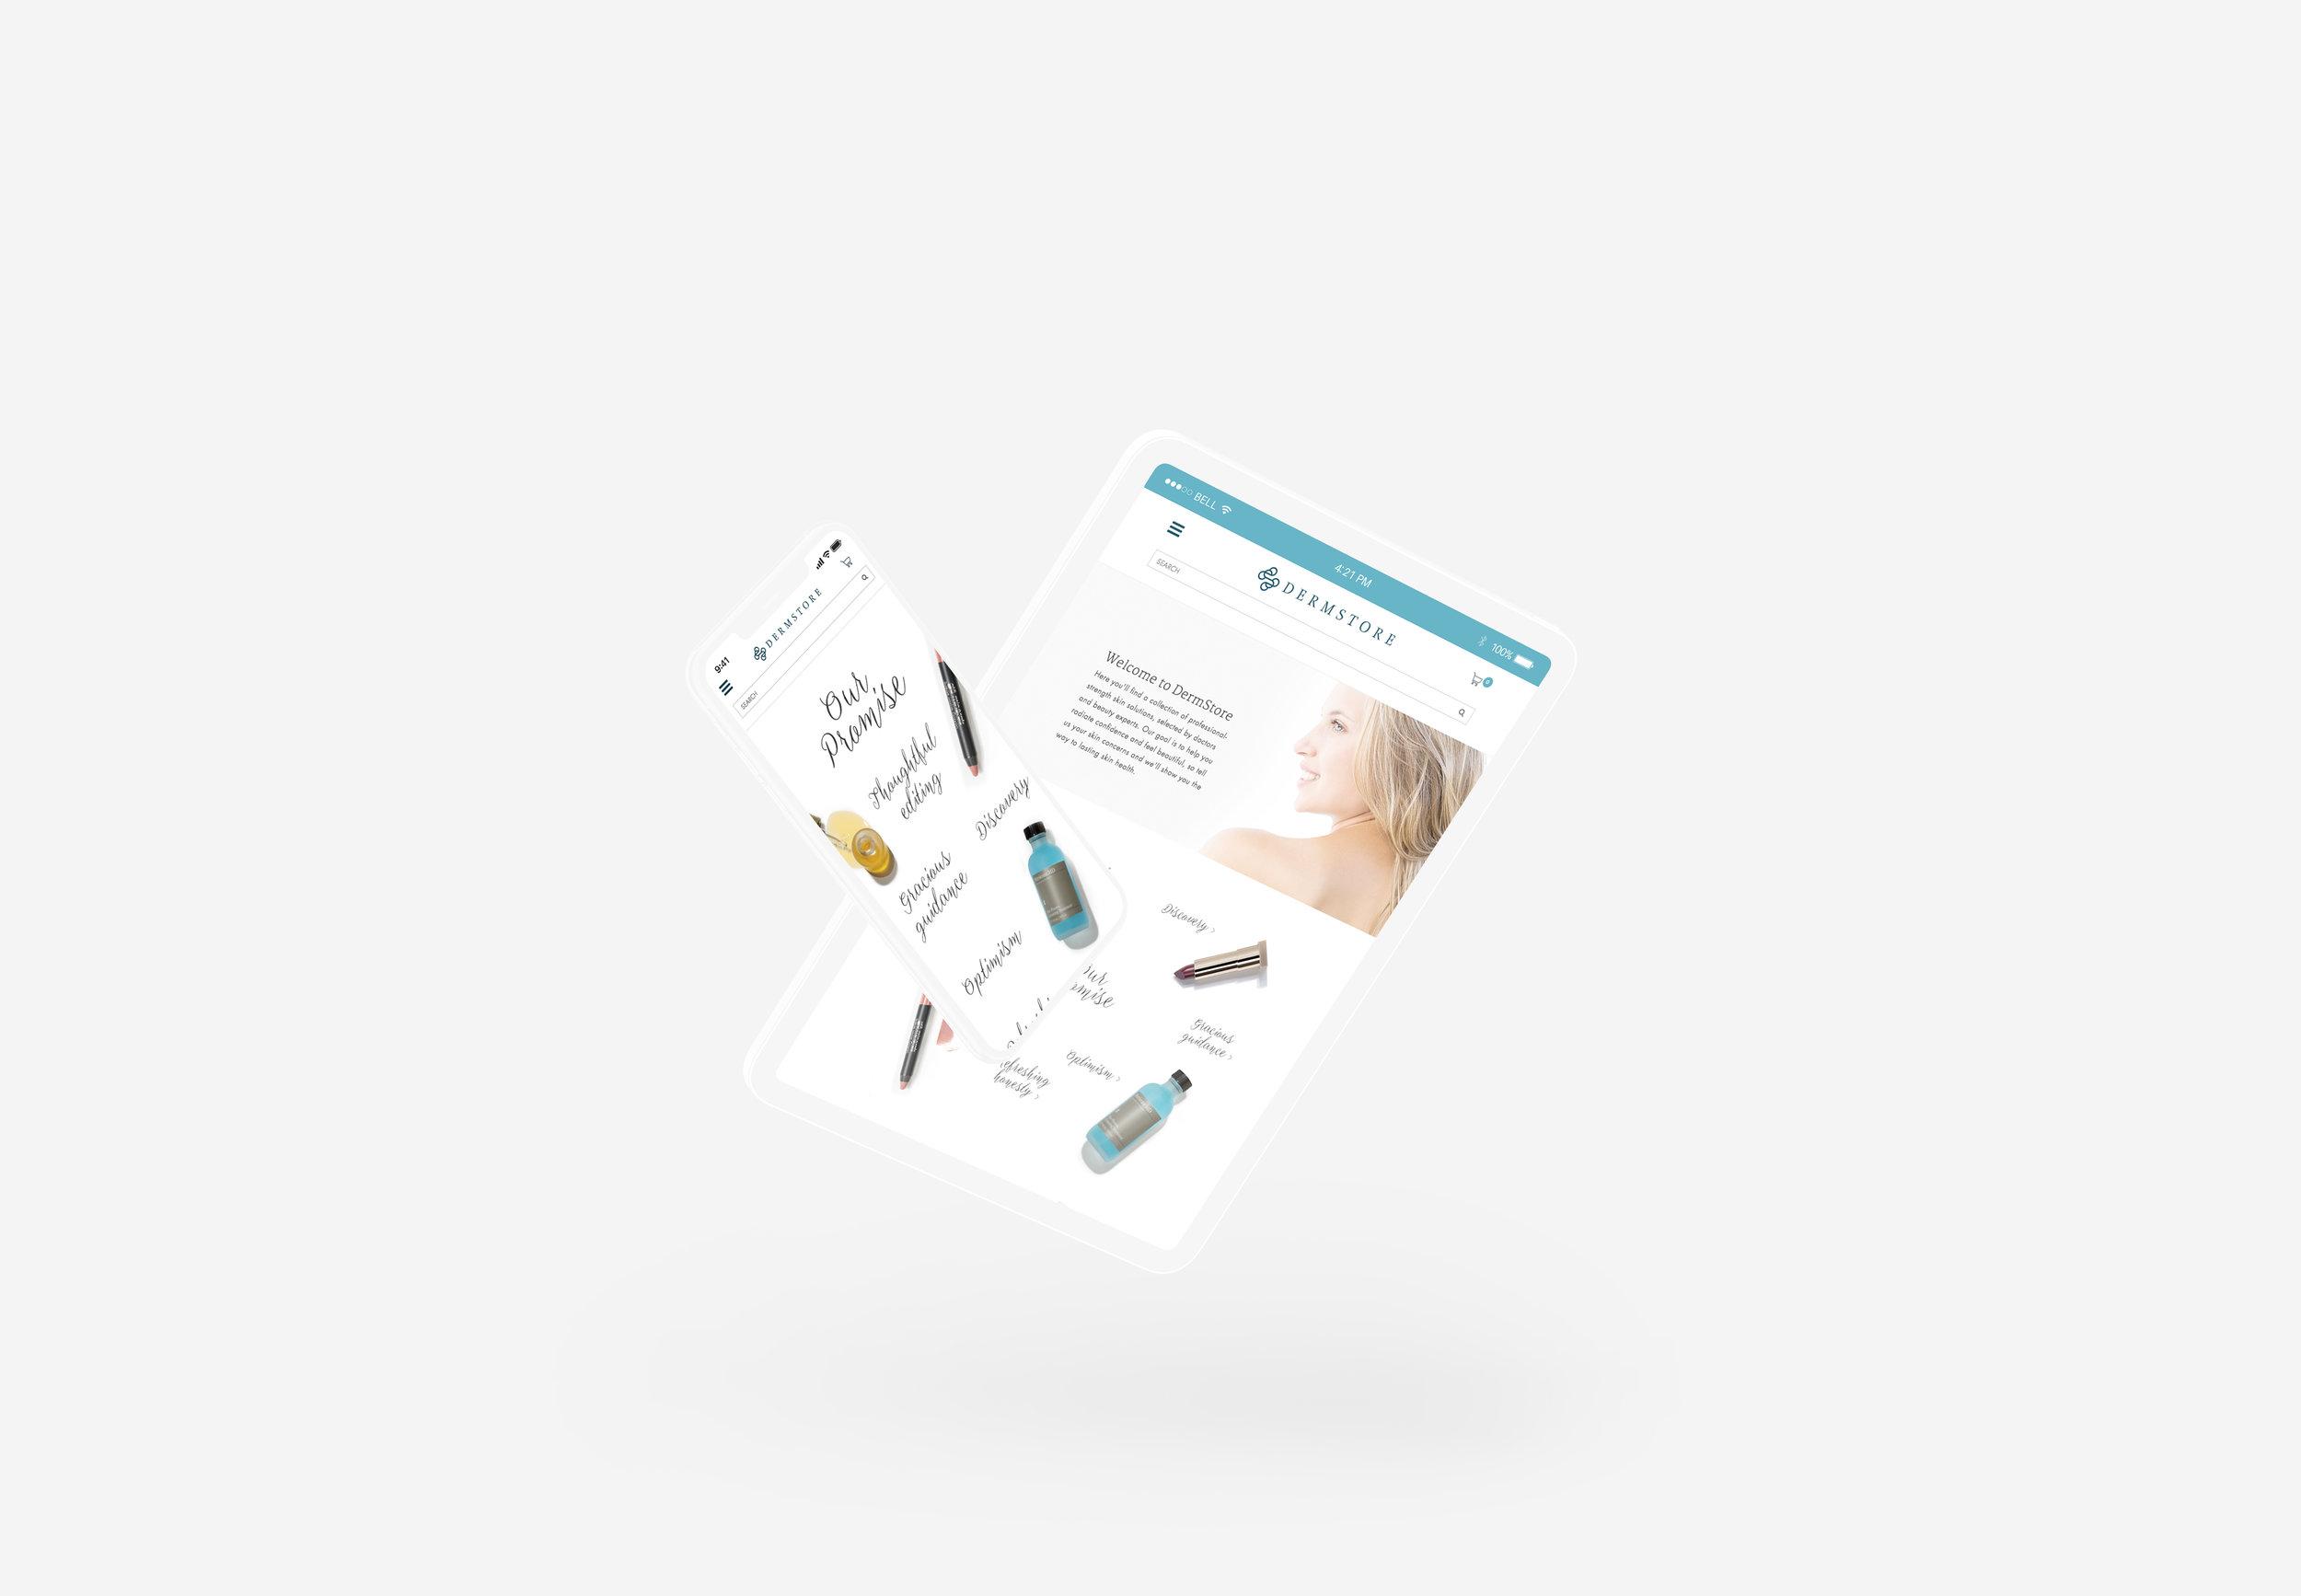 dermstore-responsive-views